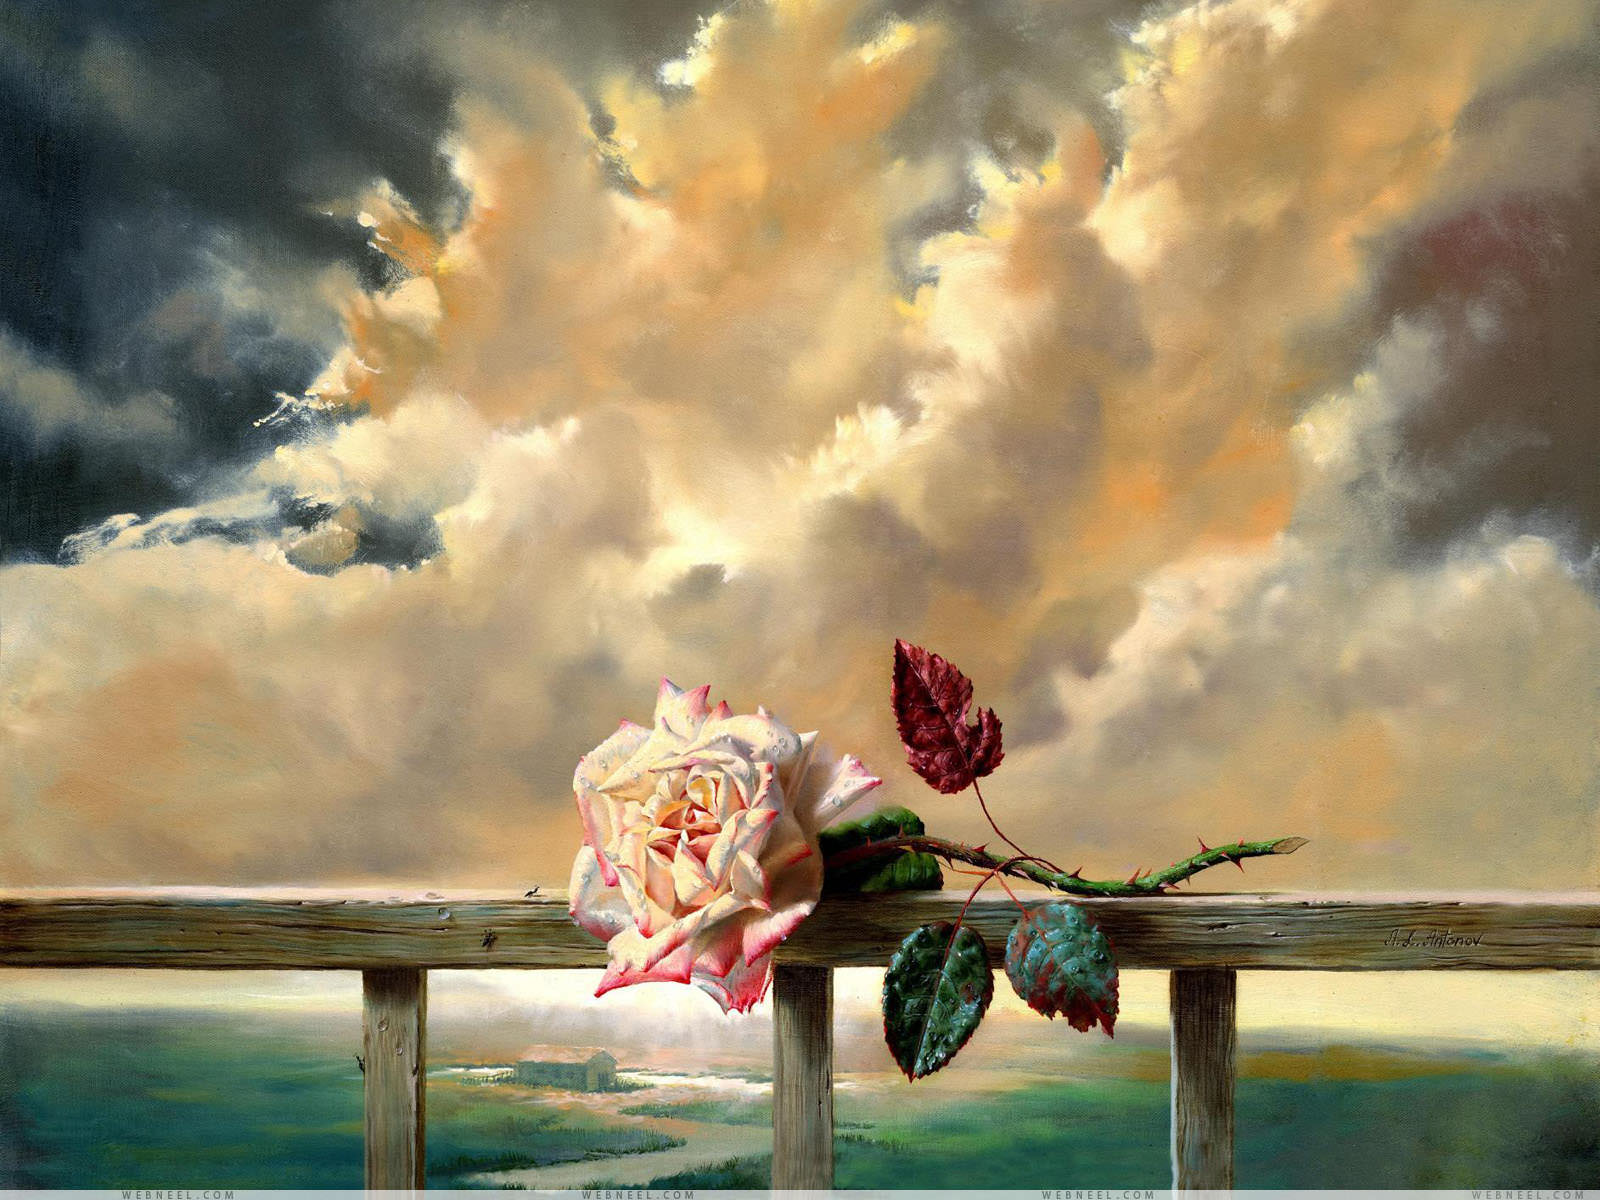 Rose Art painting Wallpaper